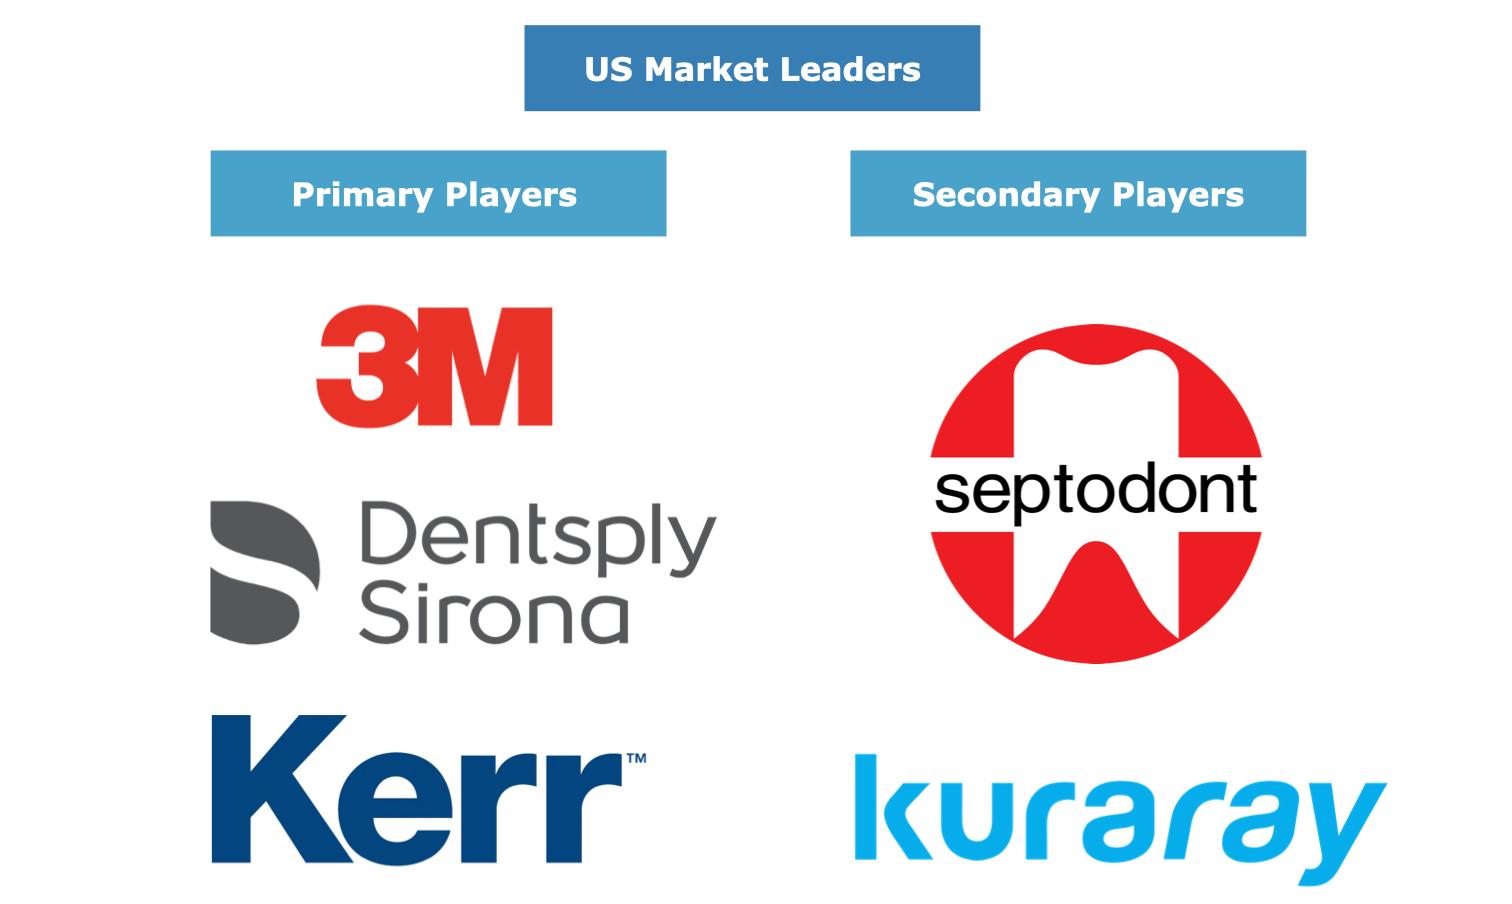 US Dental Materials Market Share Leaders